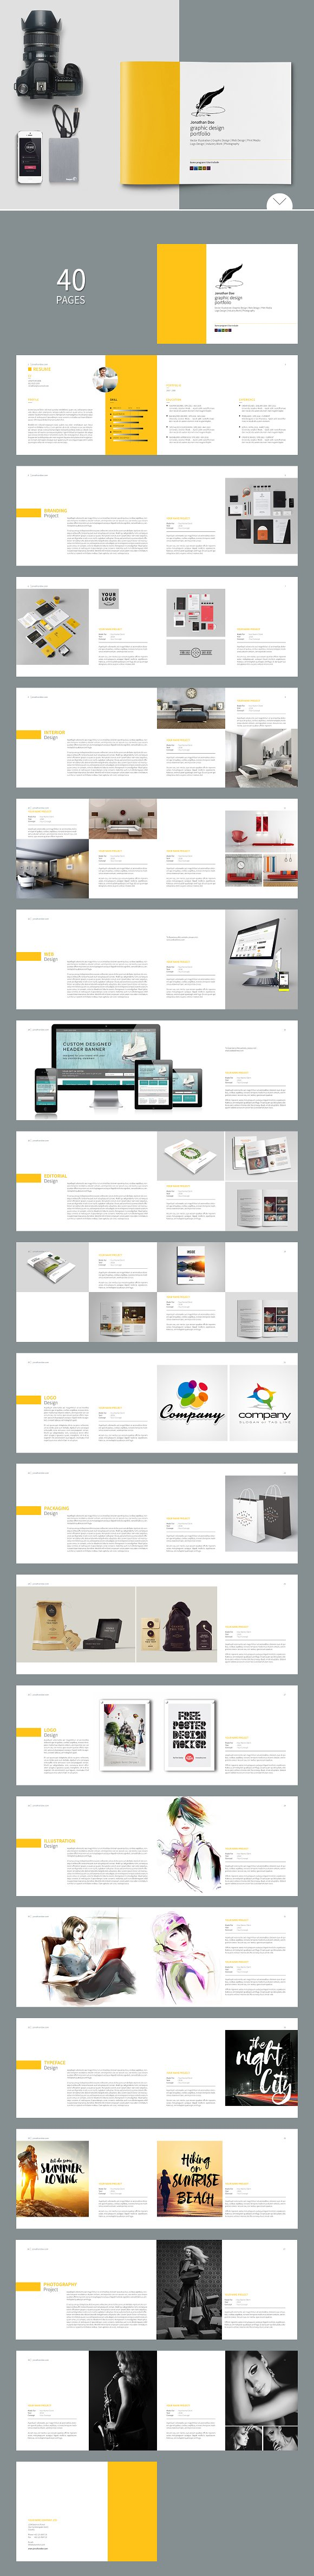 graphic design portfolio template brochure templates on creative graphic design portfolio template brochures